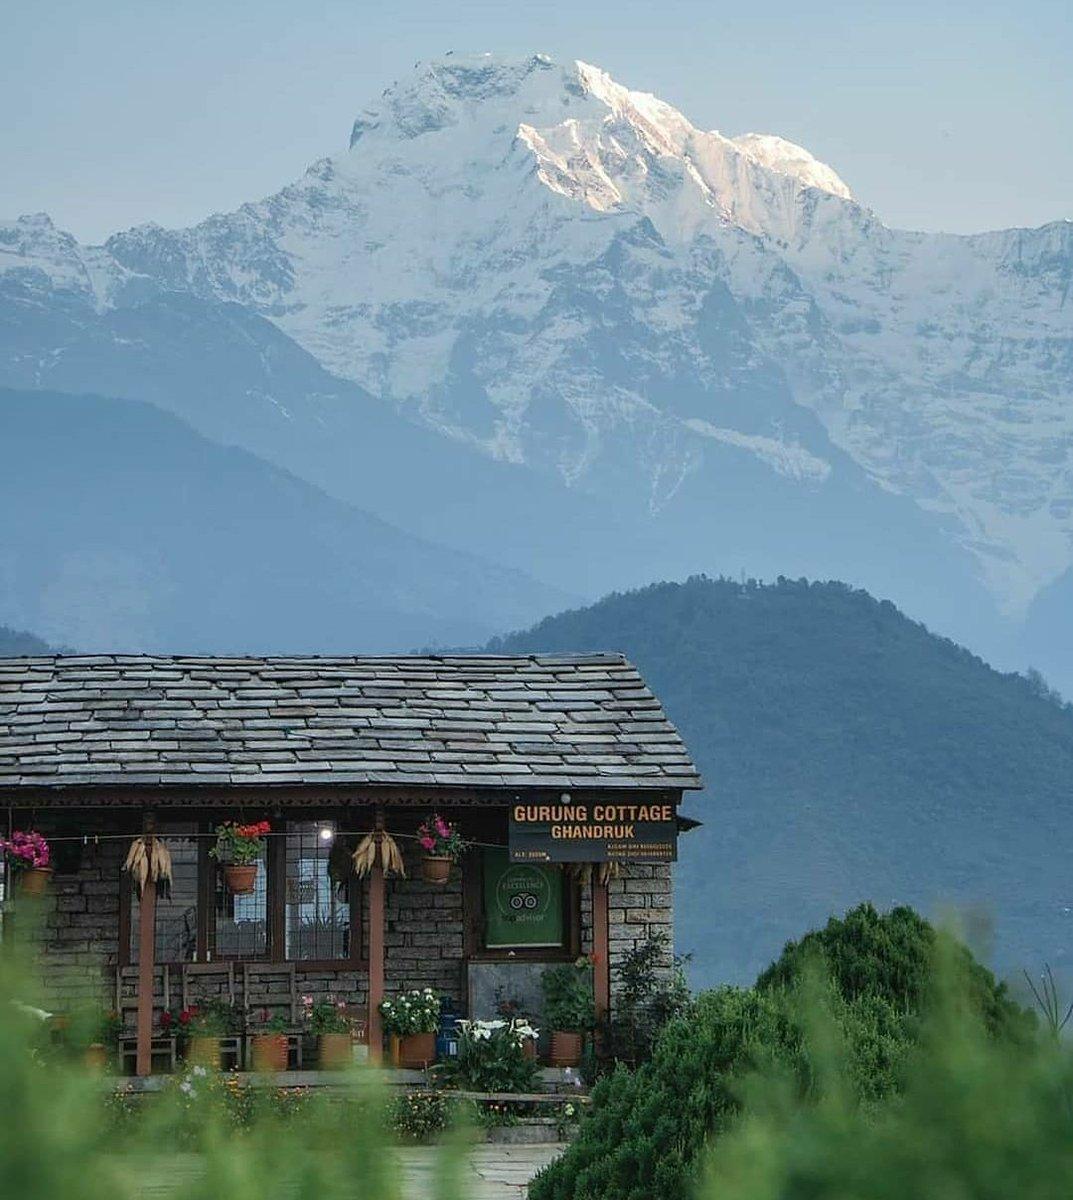 Ghandruk, Nepal 📸: @prascoooooo  #Travel #Nepal #Ghandruk https://t.co/ImnutSr790 https://t.co/8BIDCqLdpd